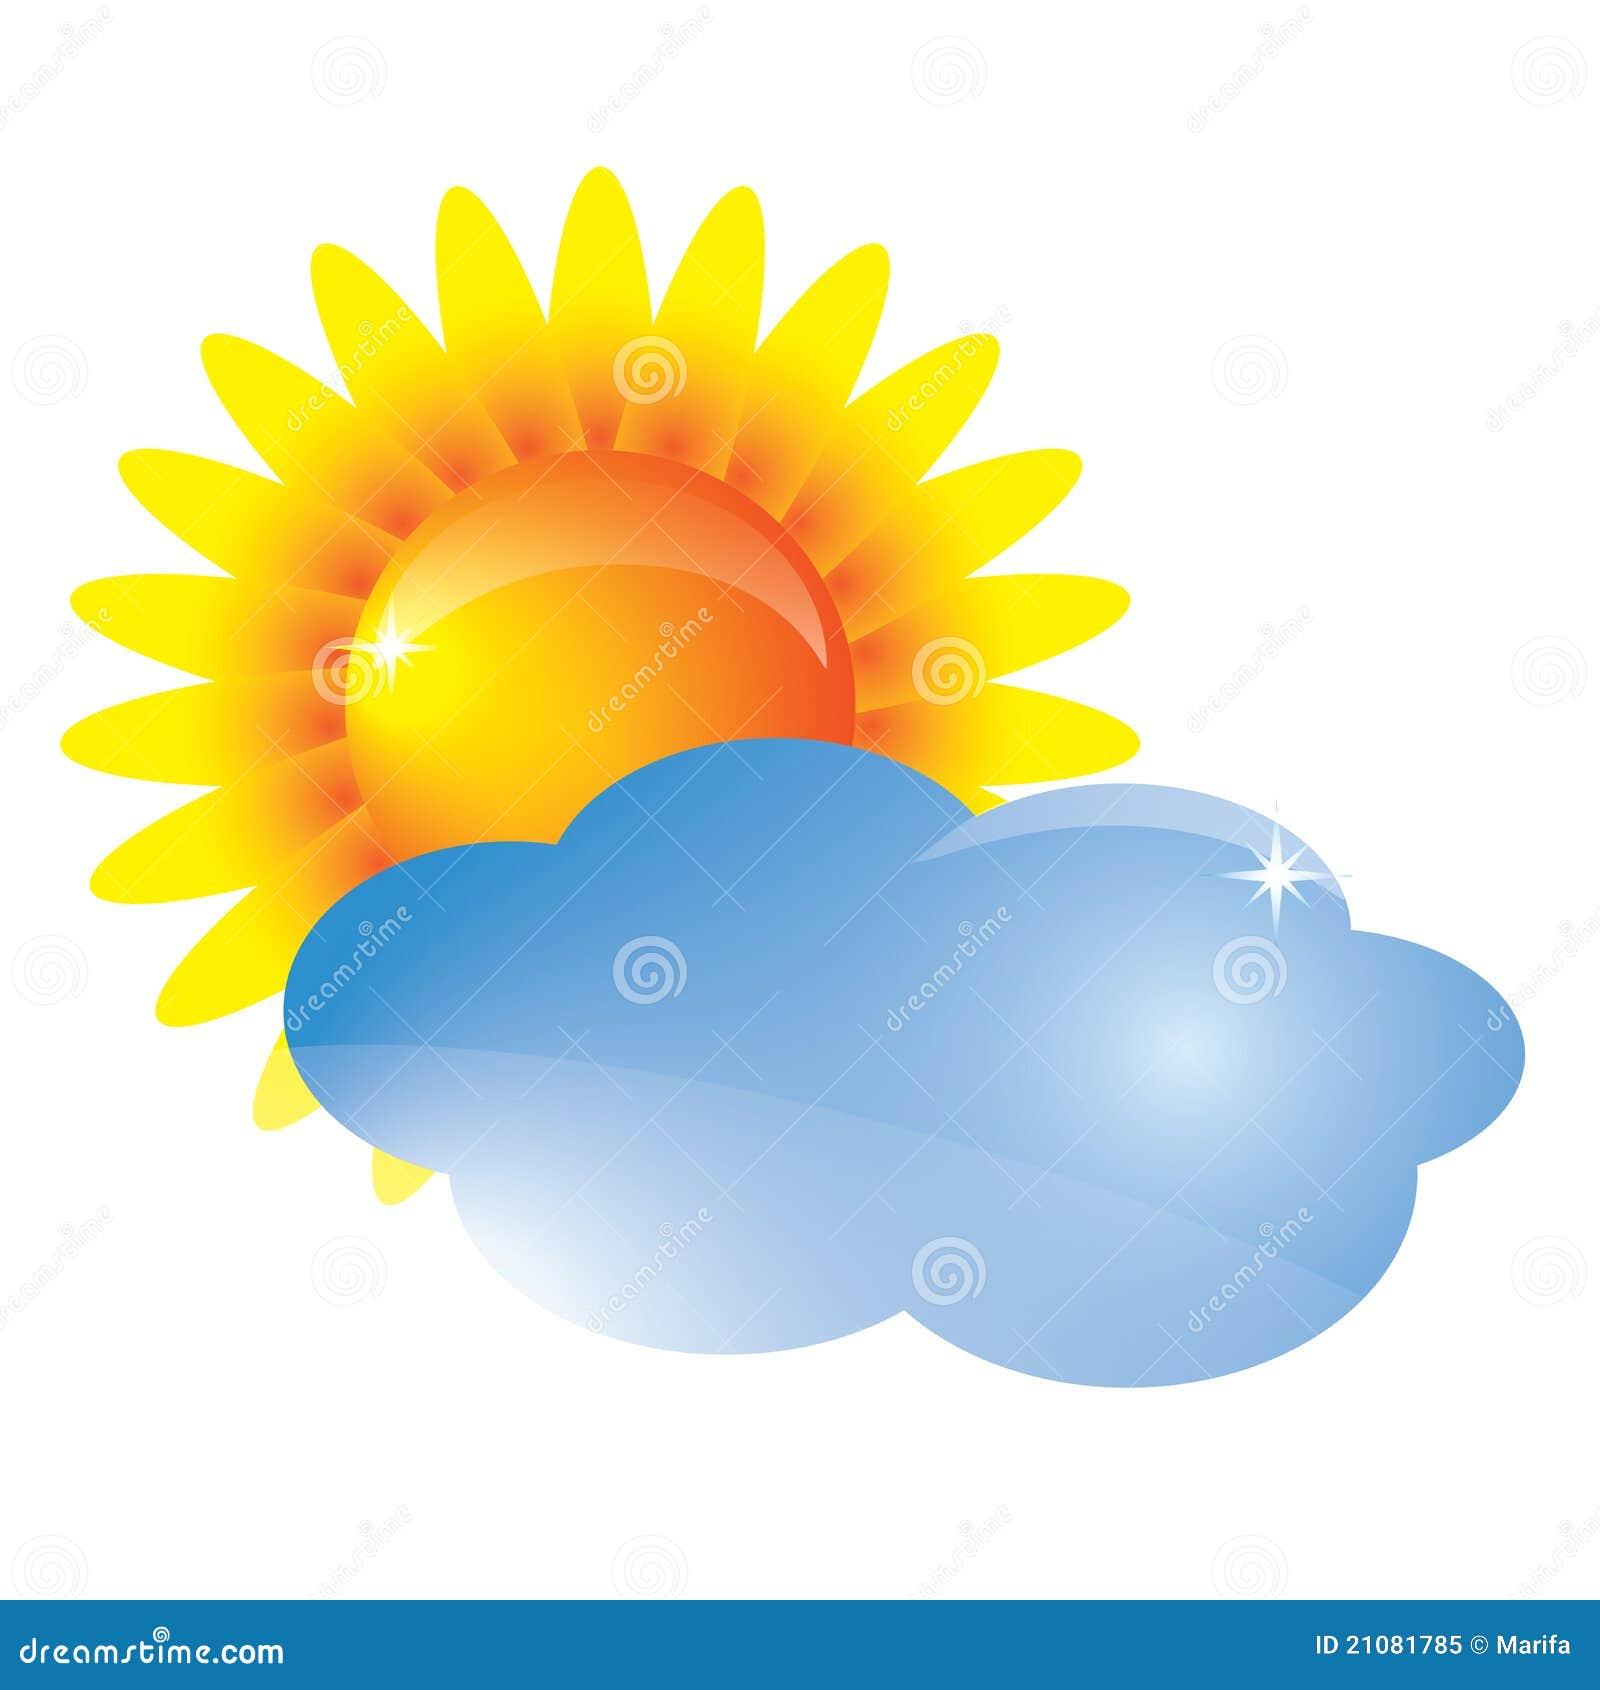 Изображение солнца графика рисунок